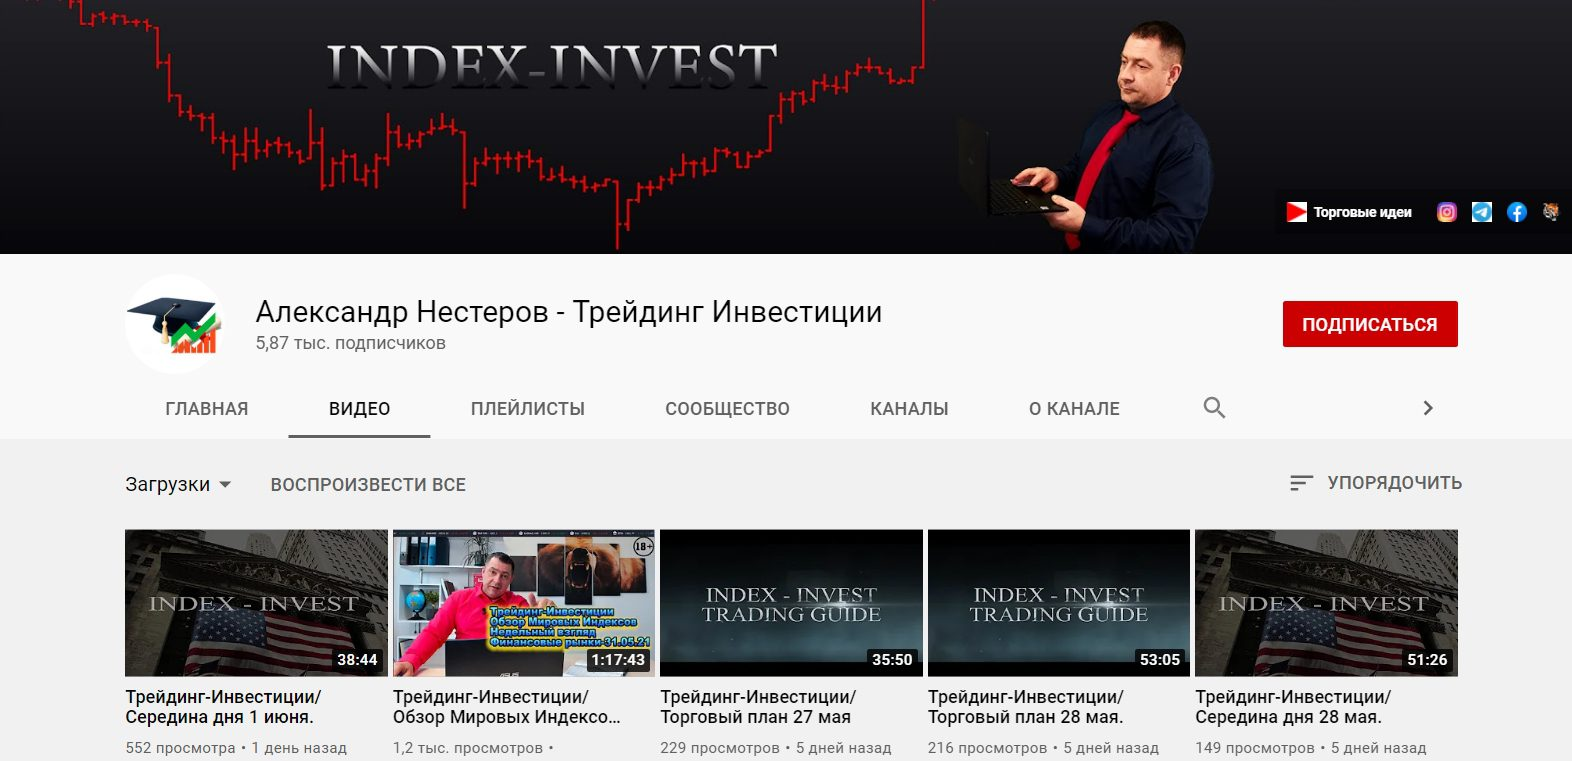 Ютуб канал Александра Нестерова